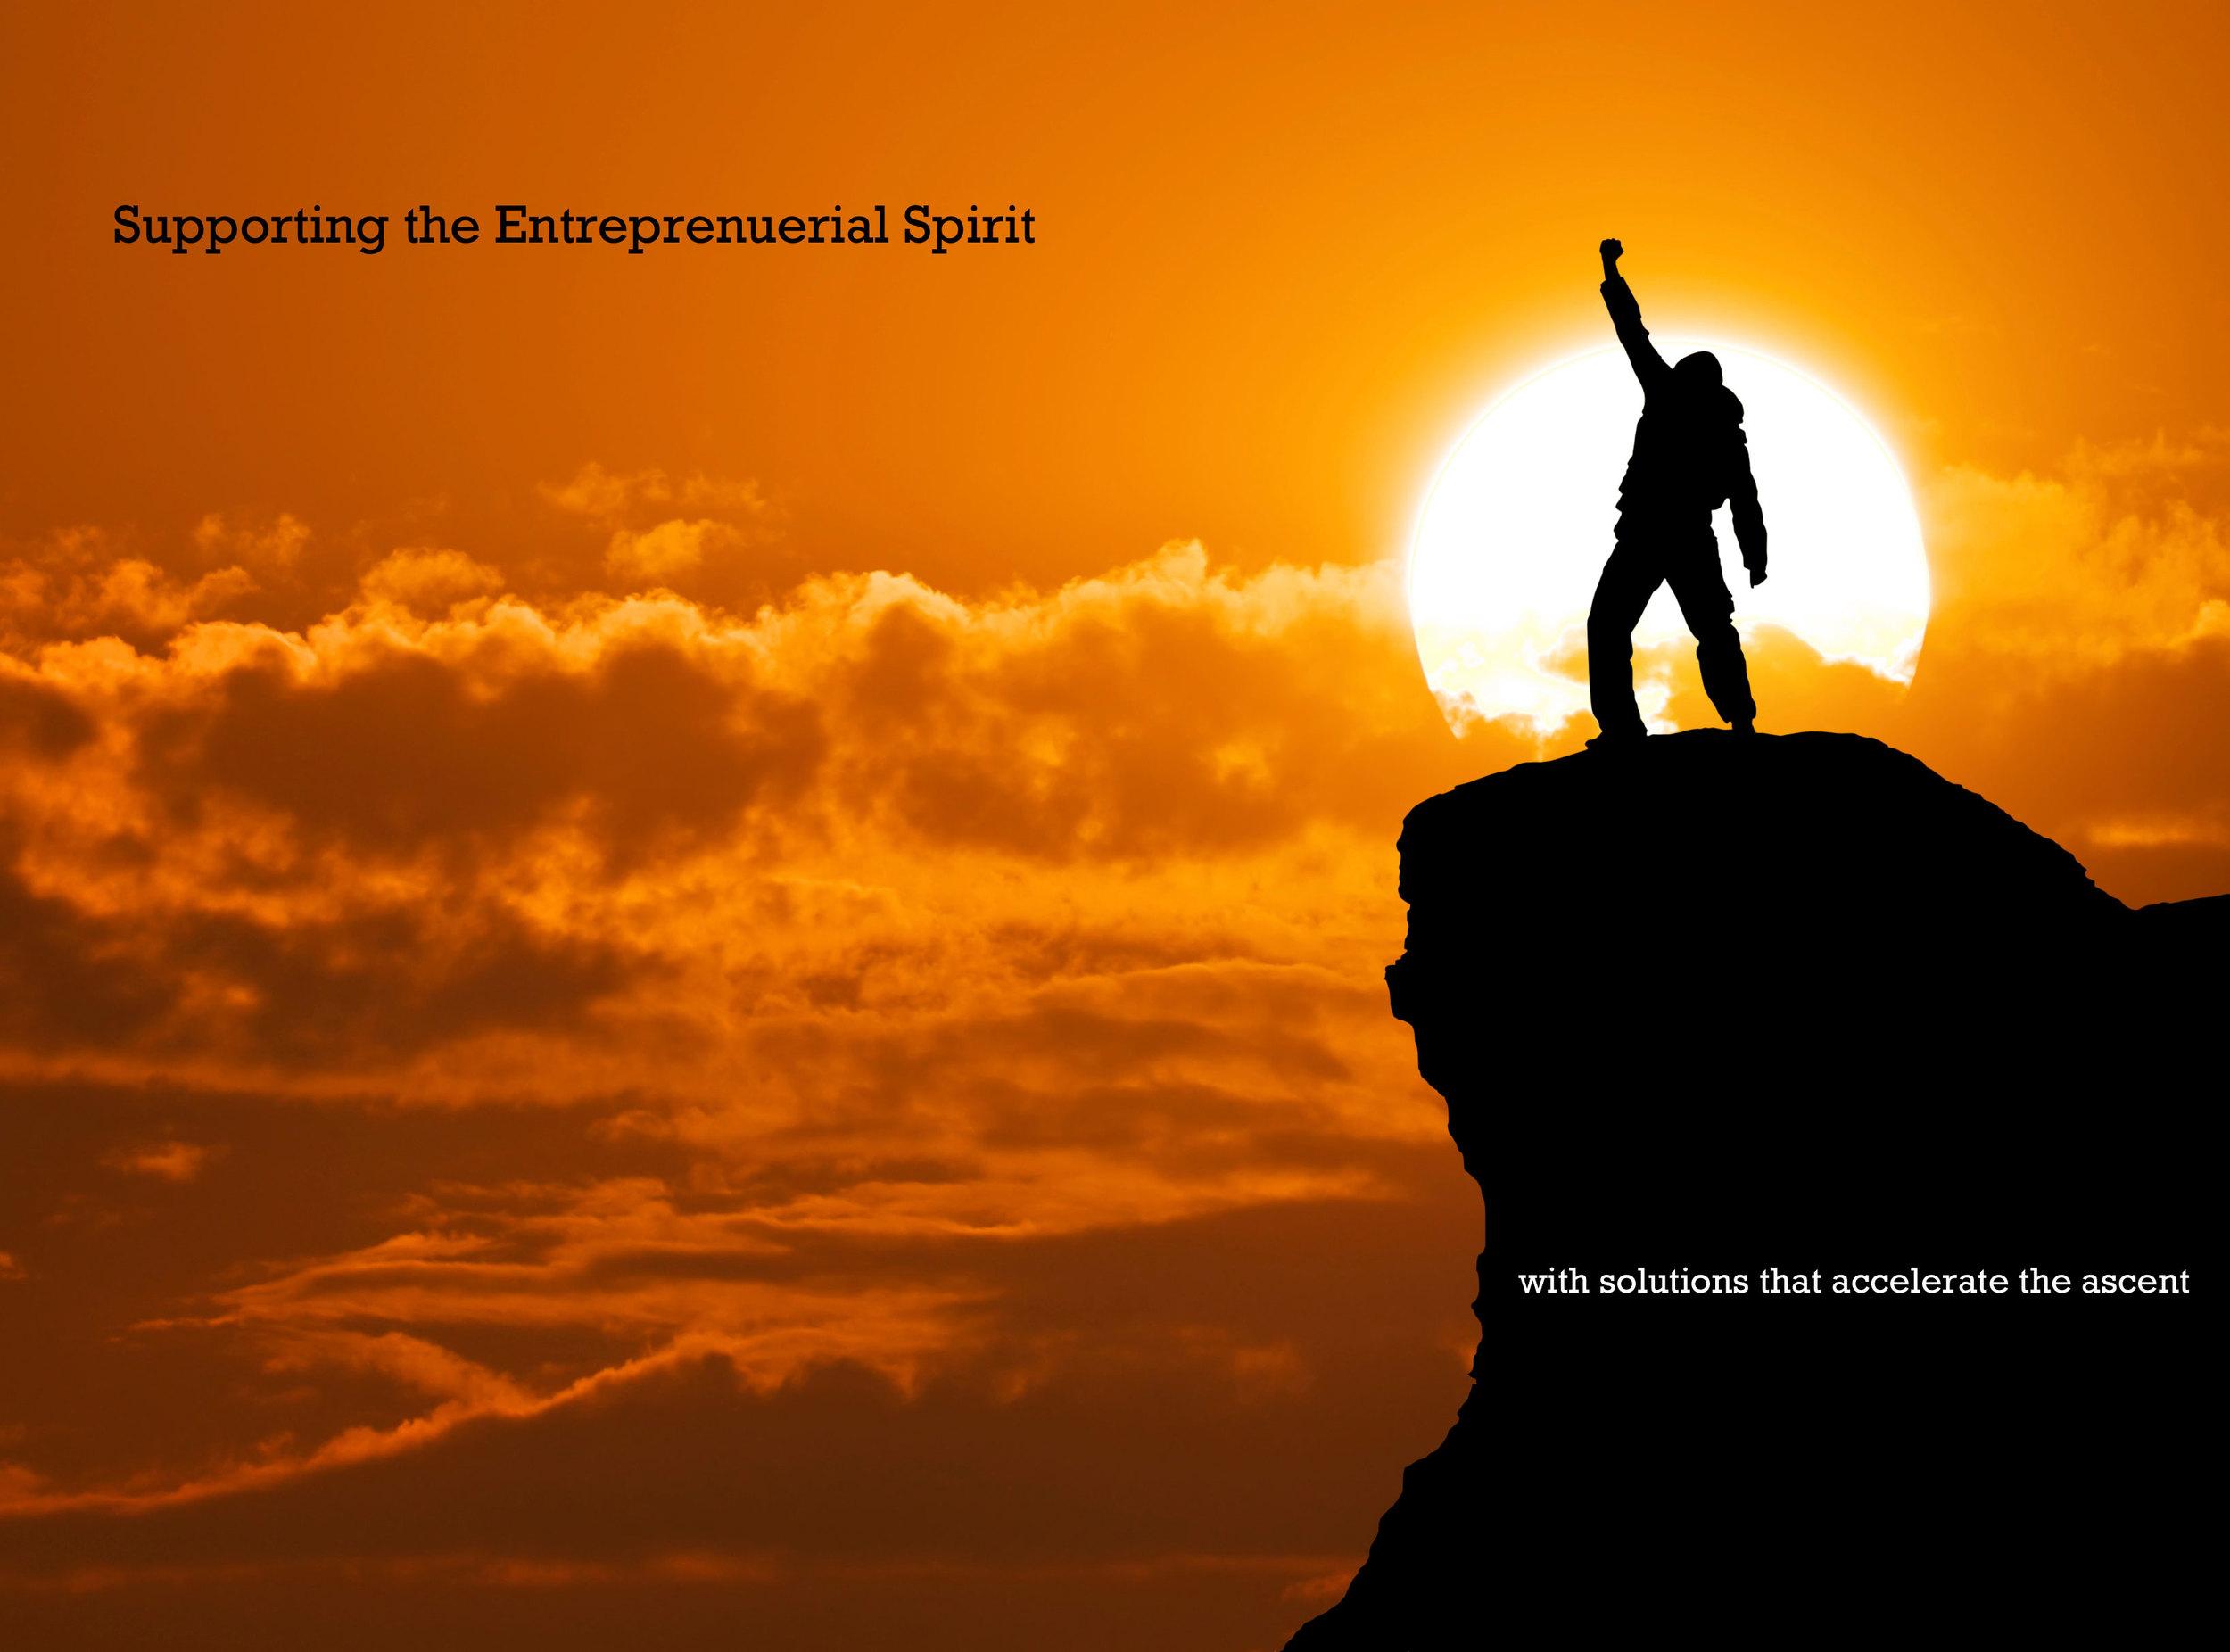 Supporting-the-Entreprenuerial-Spirit3.jpg